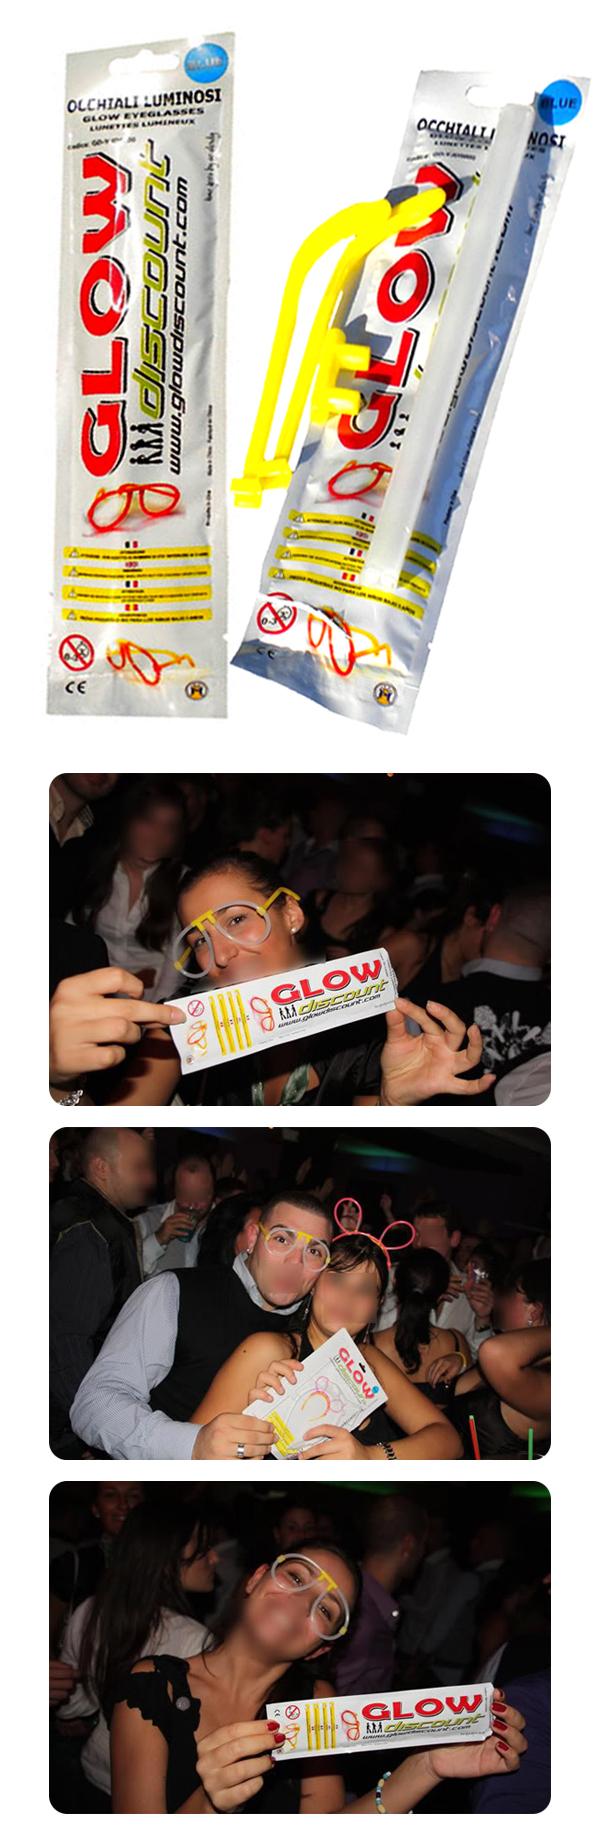 http://www.glowdiscount.com/Images/Scheda_Immagini-occhiali.jpg